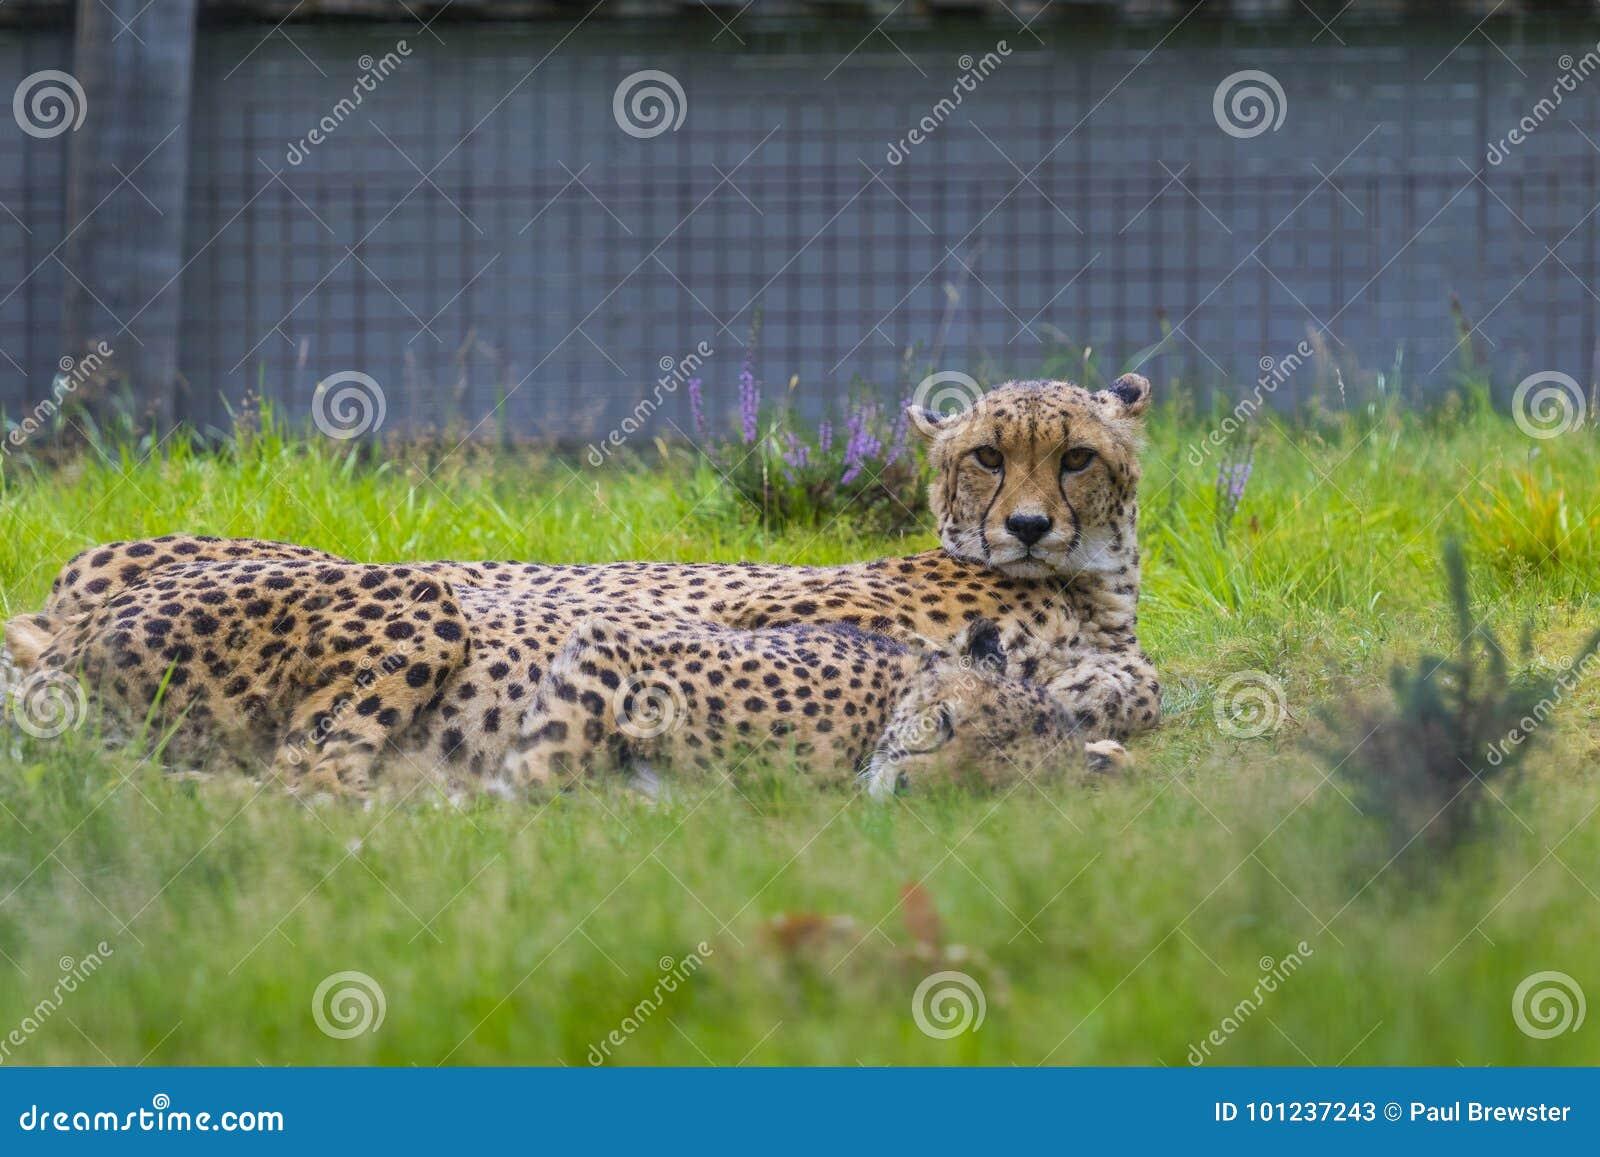 Cheetah At West Midlands Safari Park Zoo Stock Image - Image